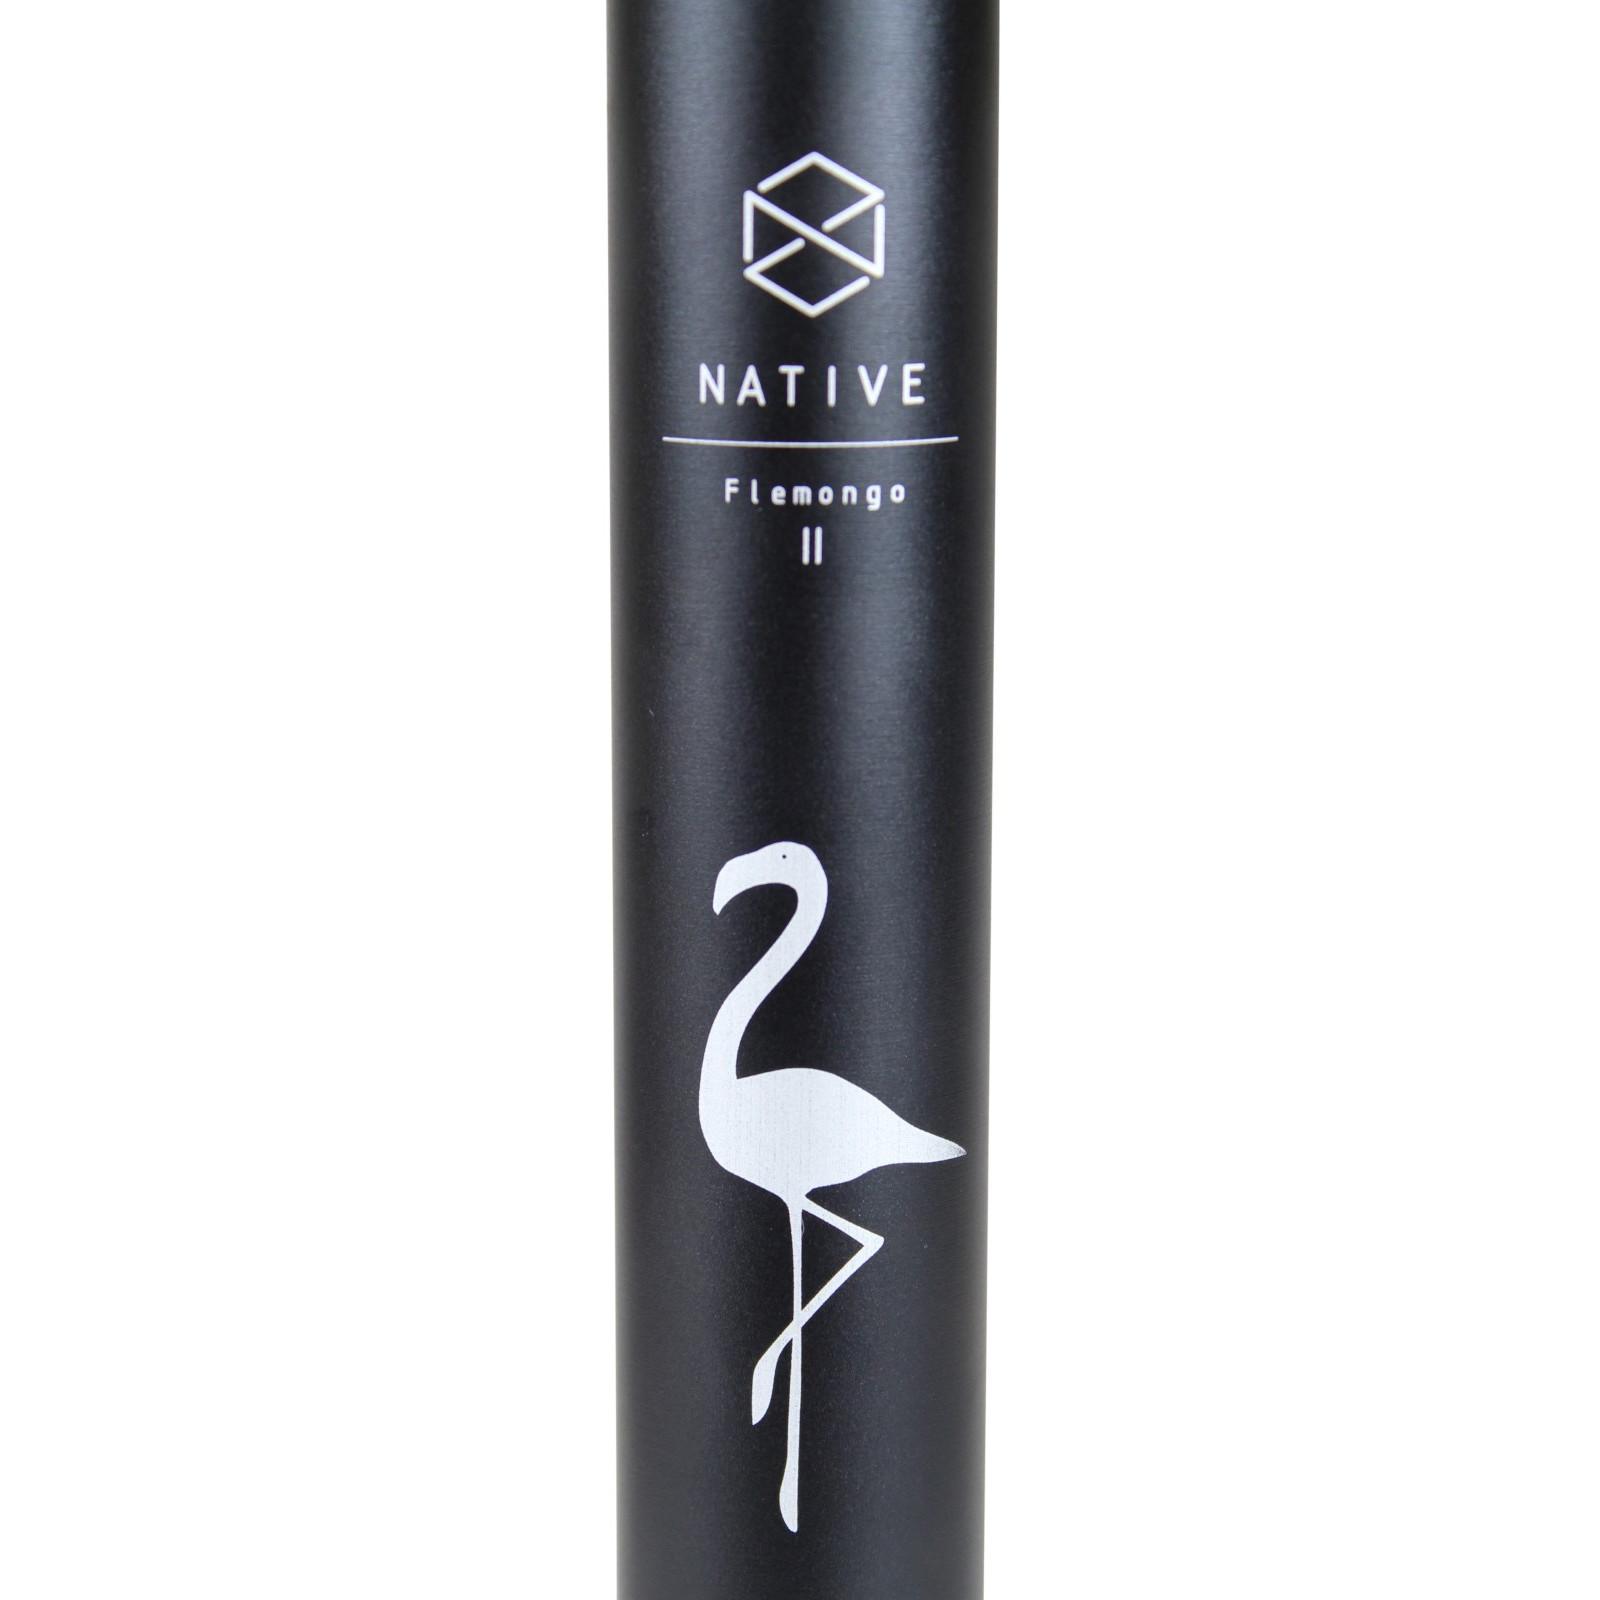 Вилка для трюкового самоката NATIVE Flemongo 2 (Black)